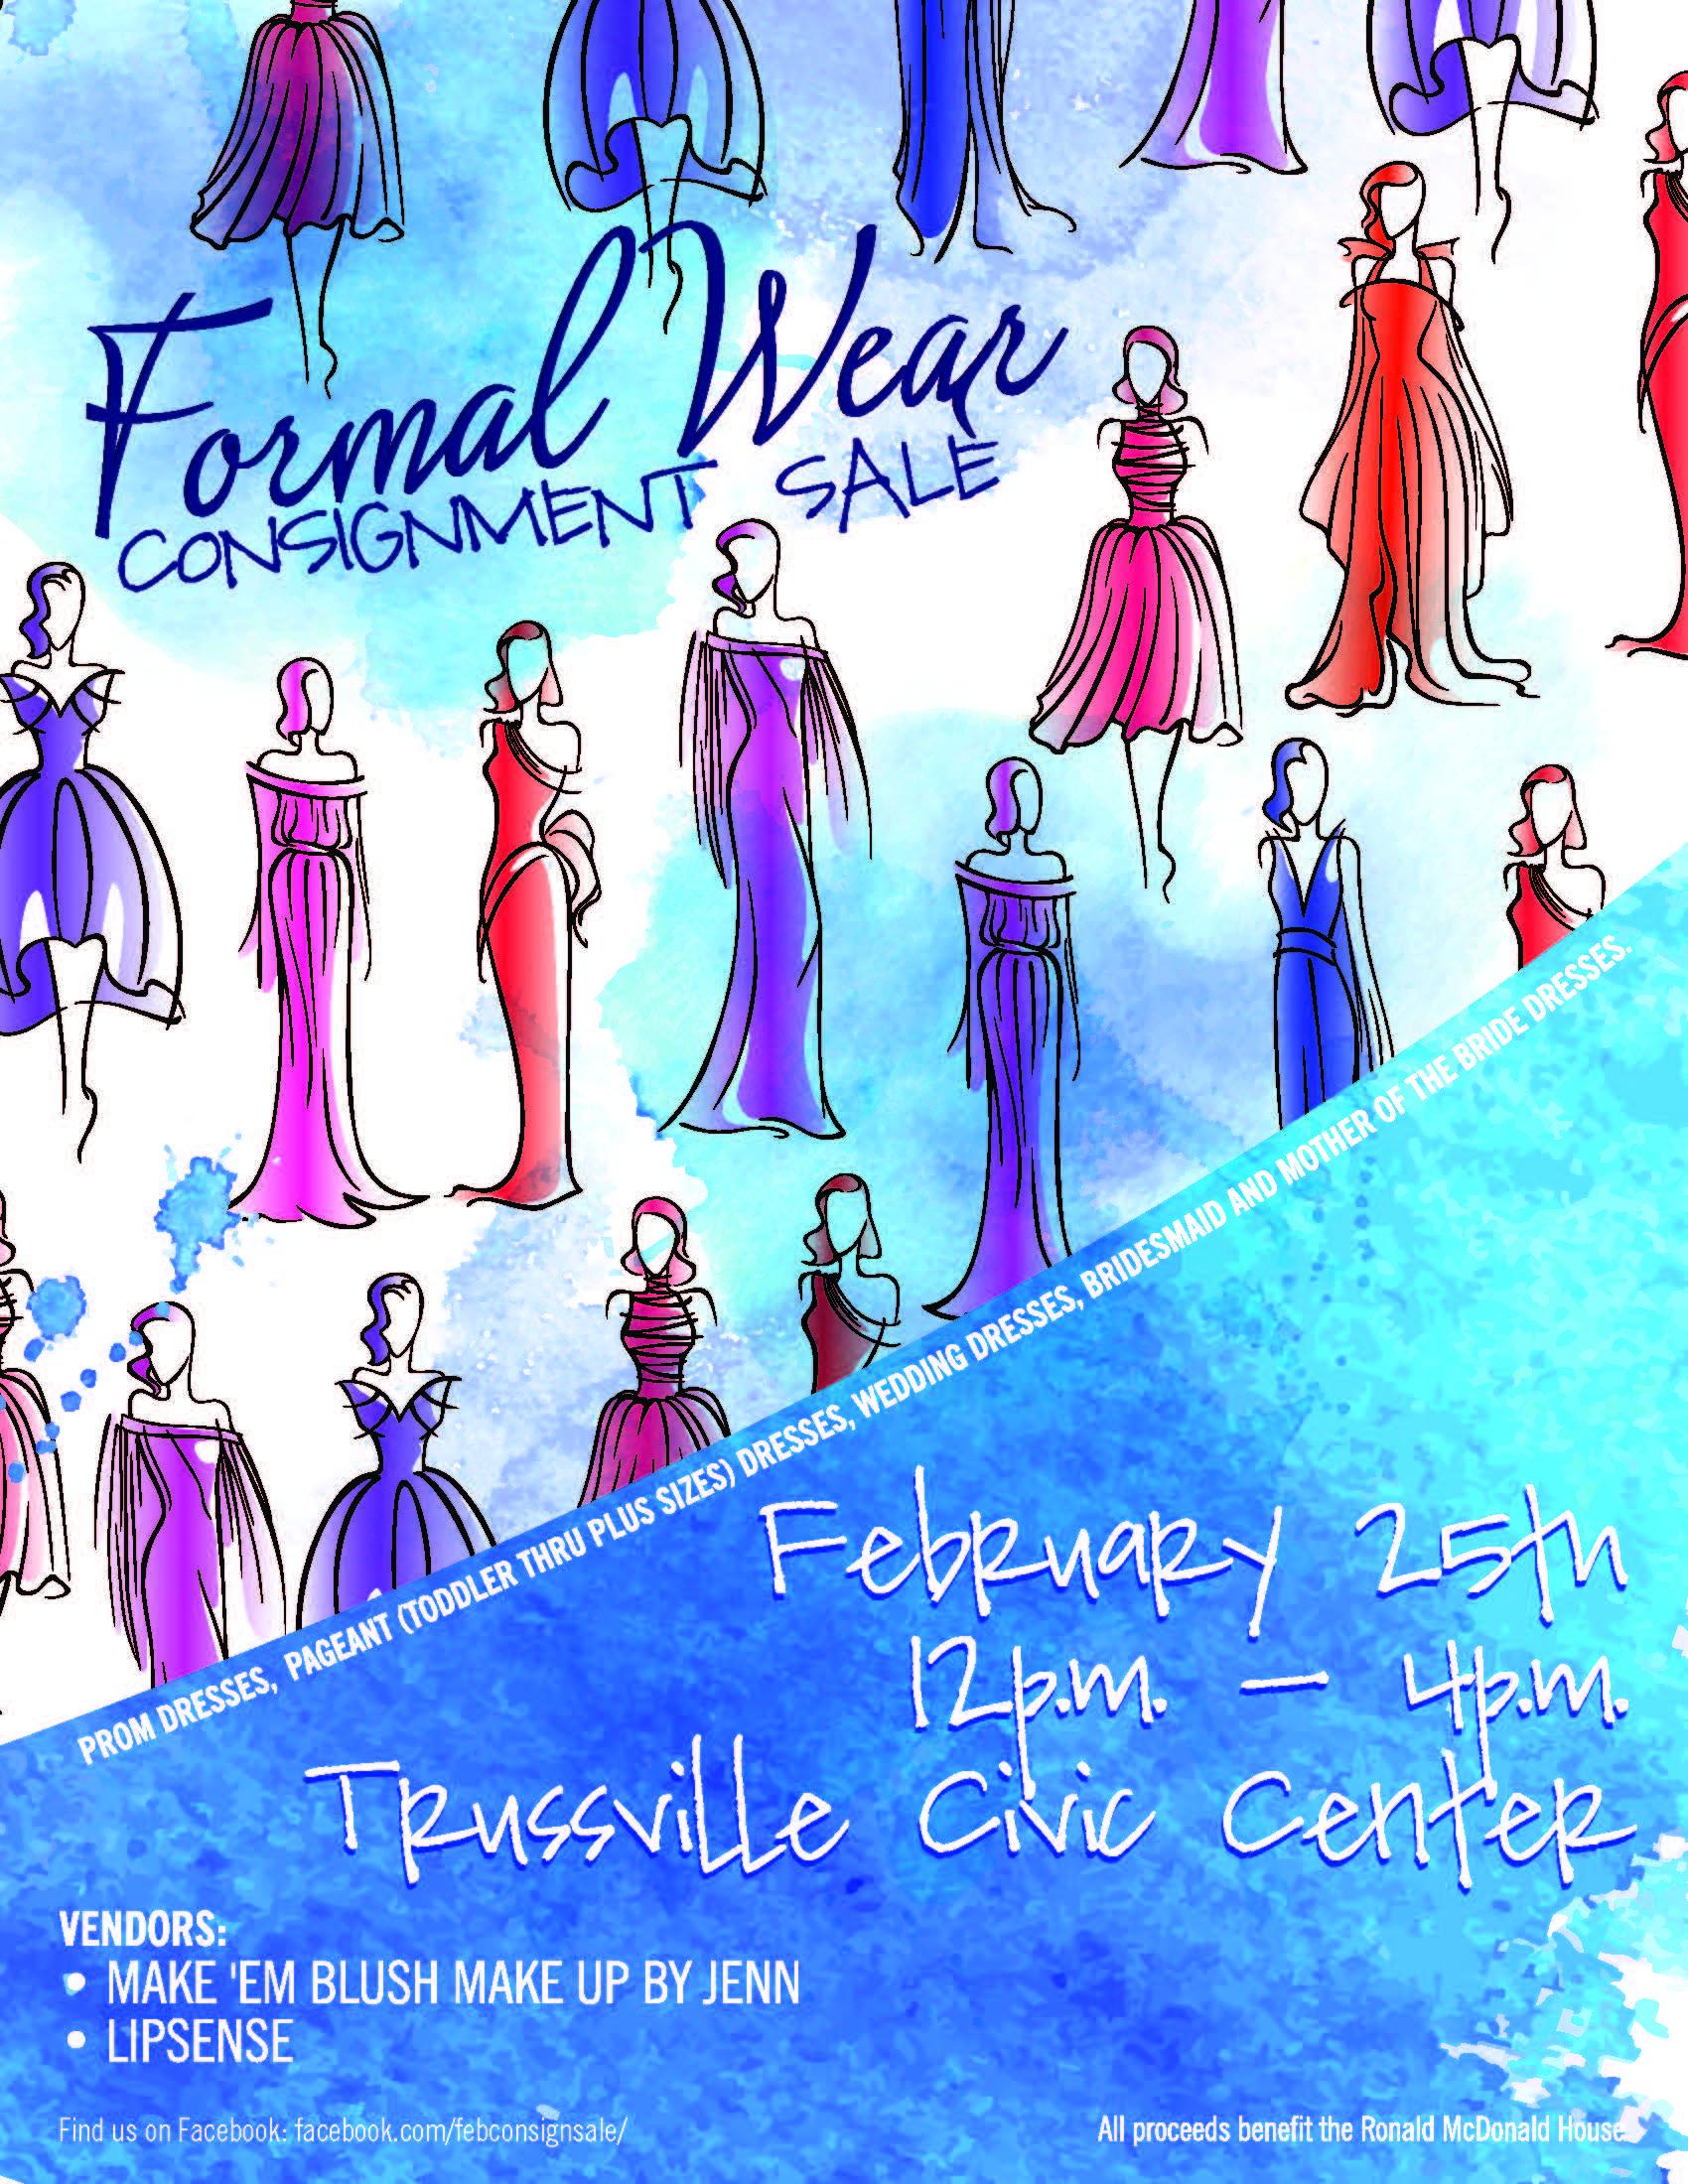 Prom dress sale fundraiser - Fashion dresses